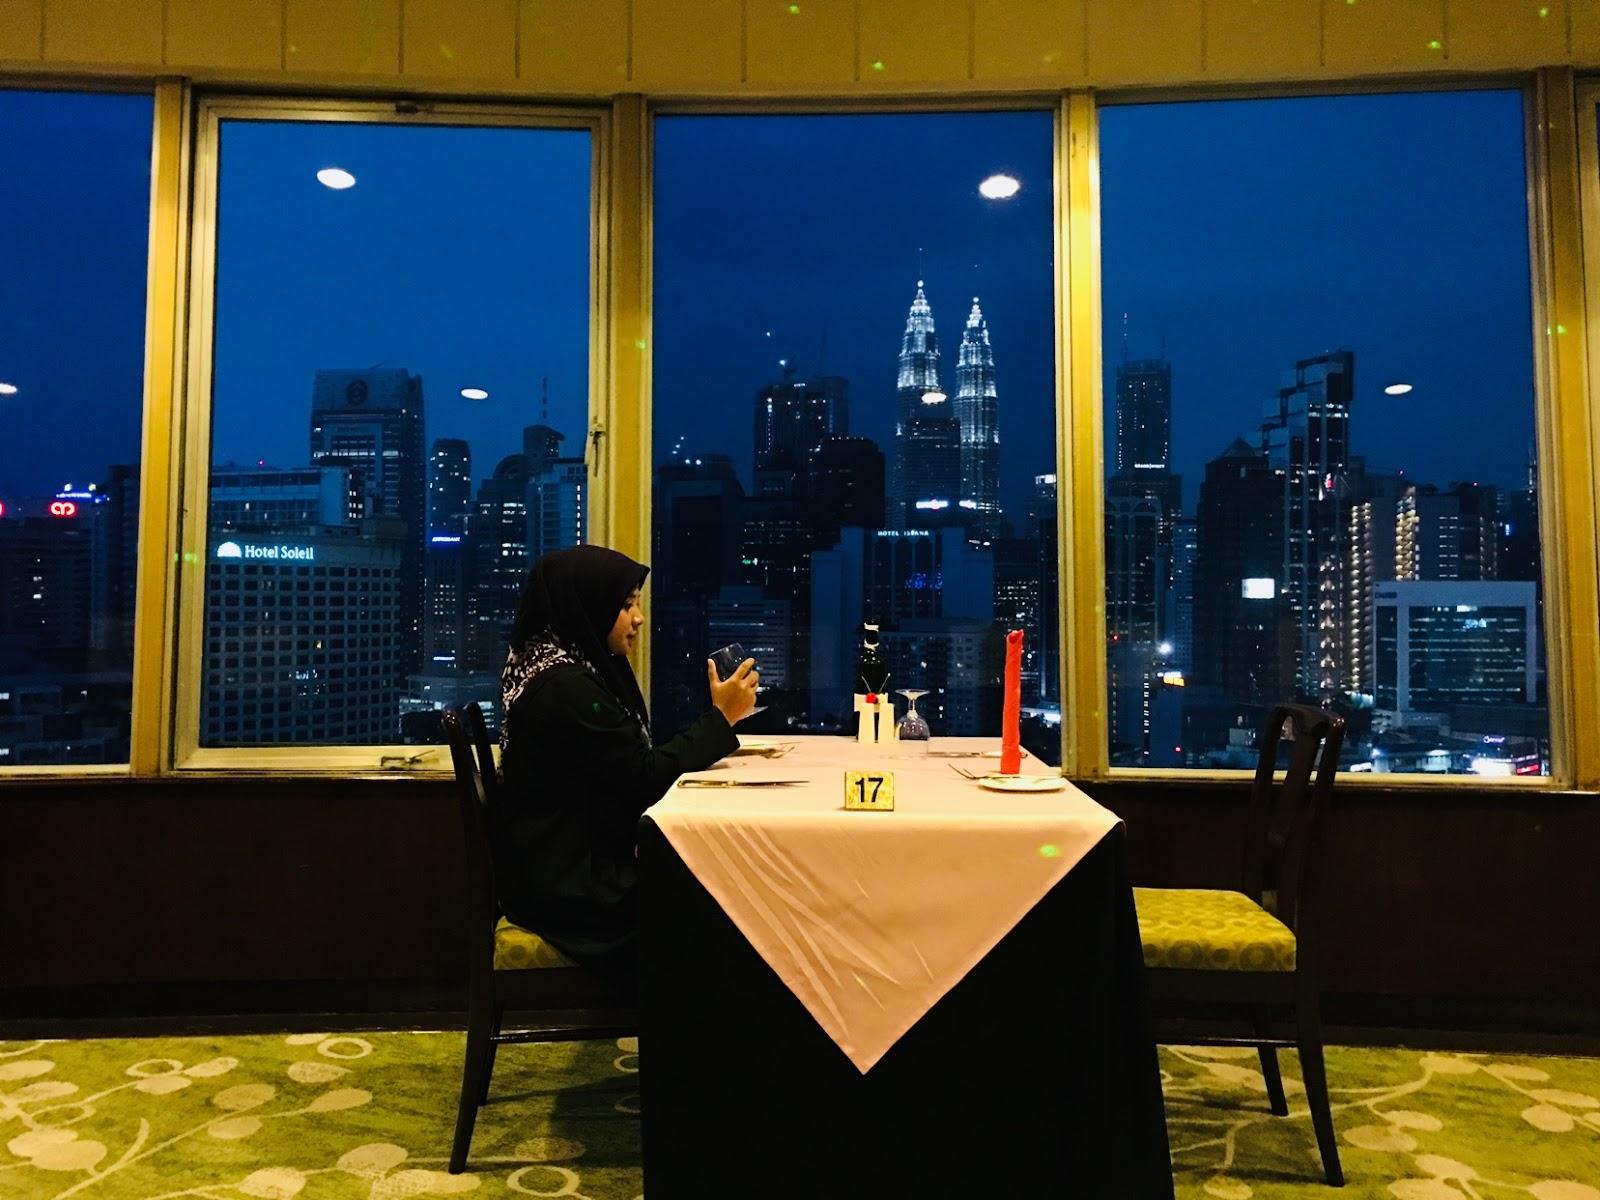 Plants conjointly Romantis Lumpur Kuala Dating Di Tempat patient Instagram, the